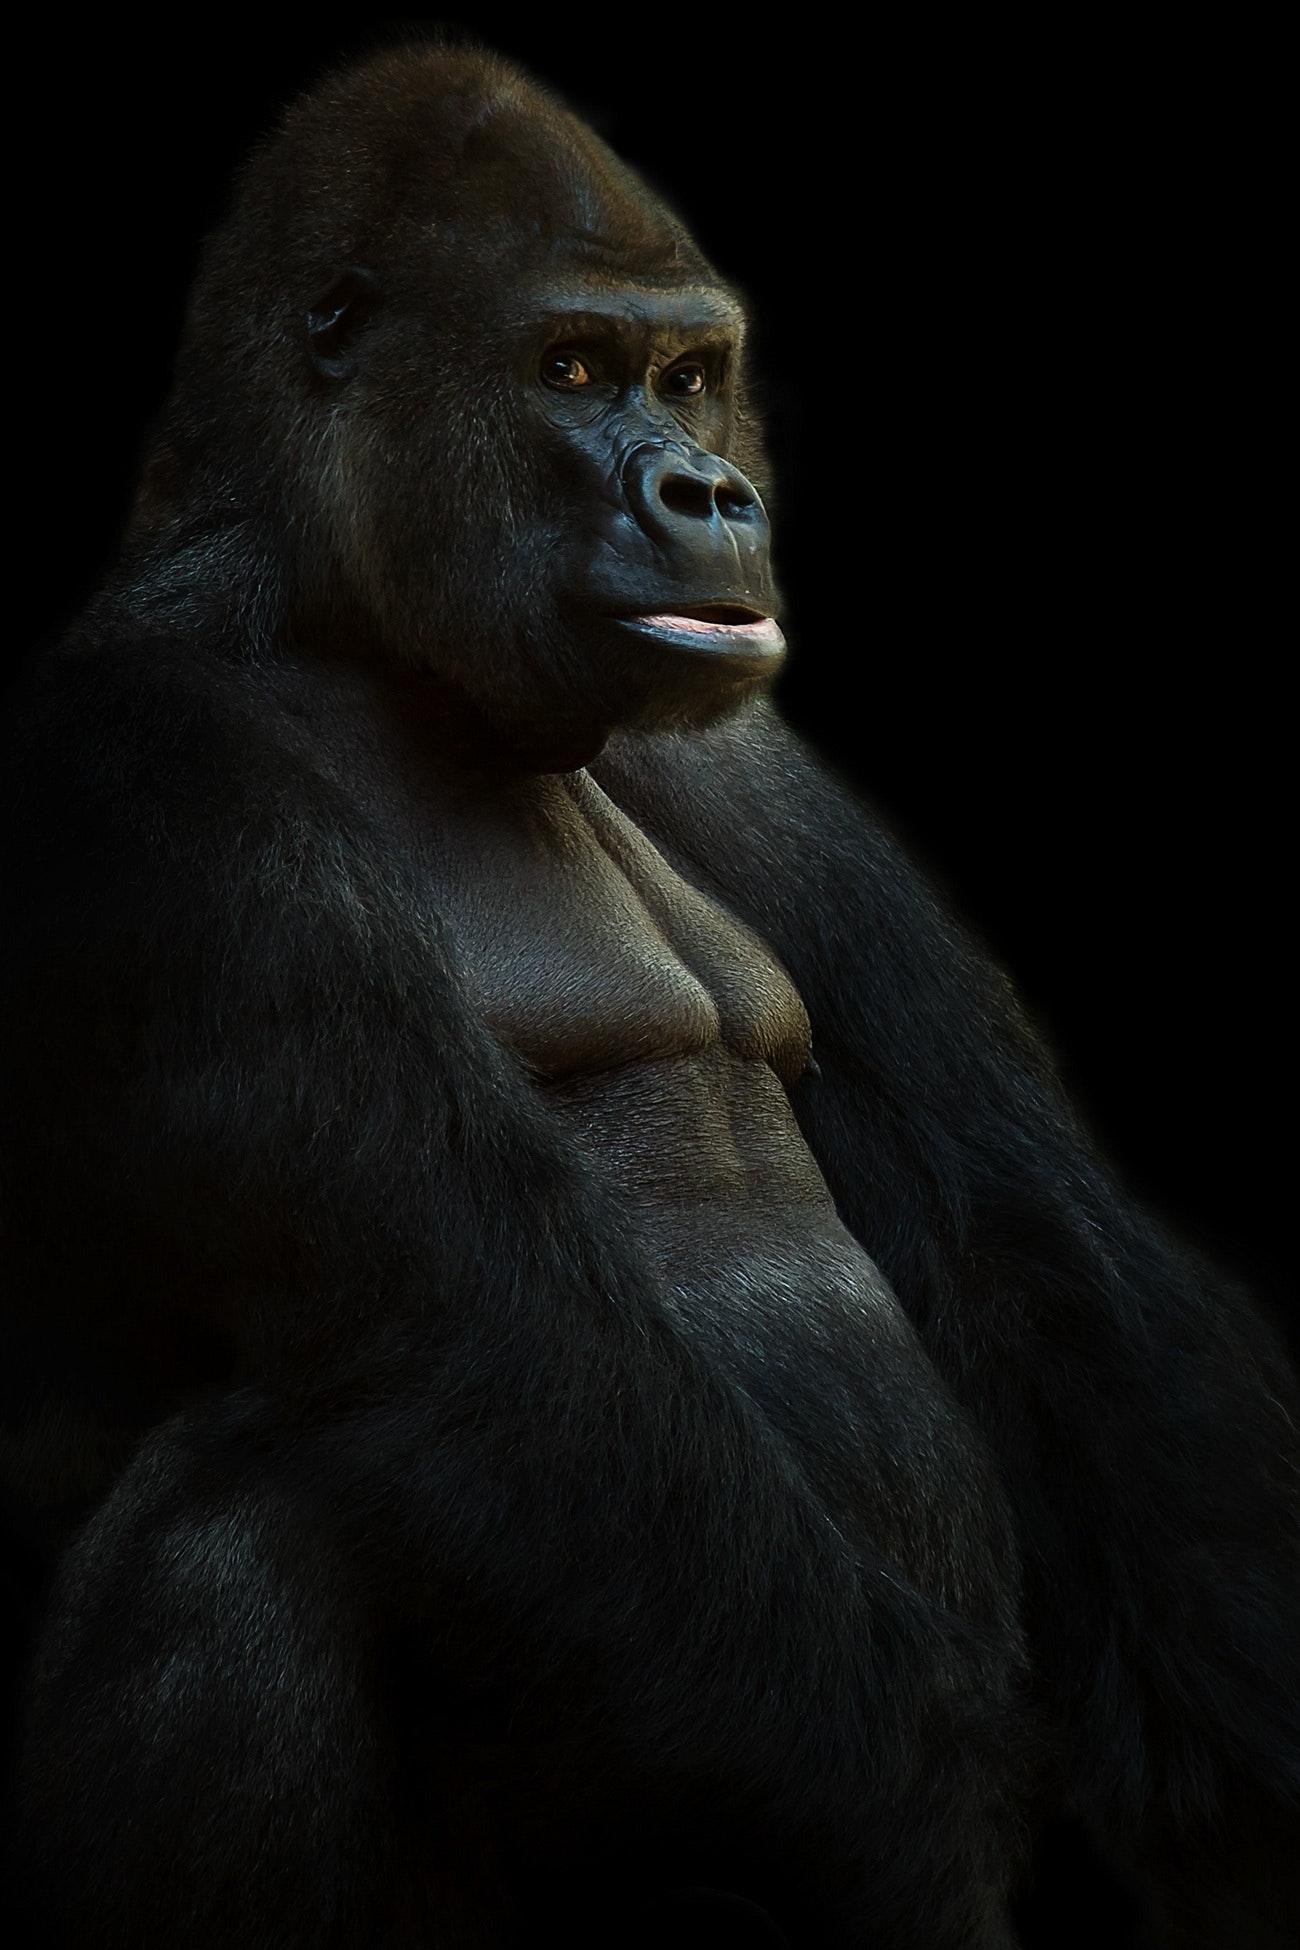 Sort Gorilla Gratis Stock Foto-3282